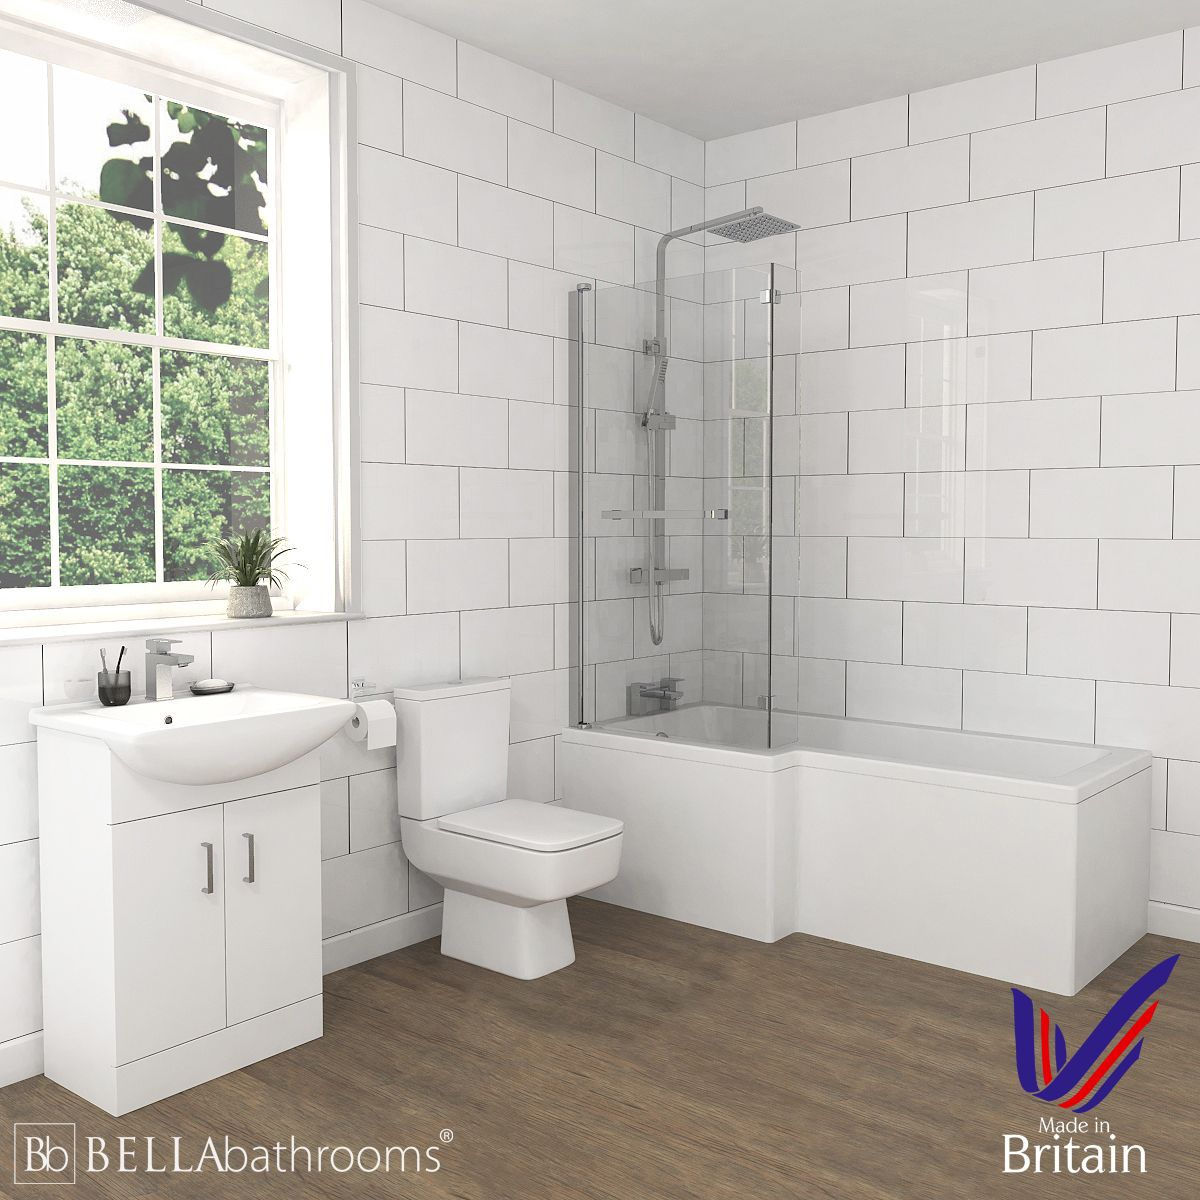 Bliss White Vanity Unit Left Handed L Shaped Shower Bath Suite